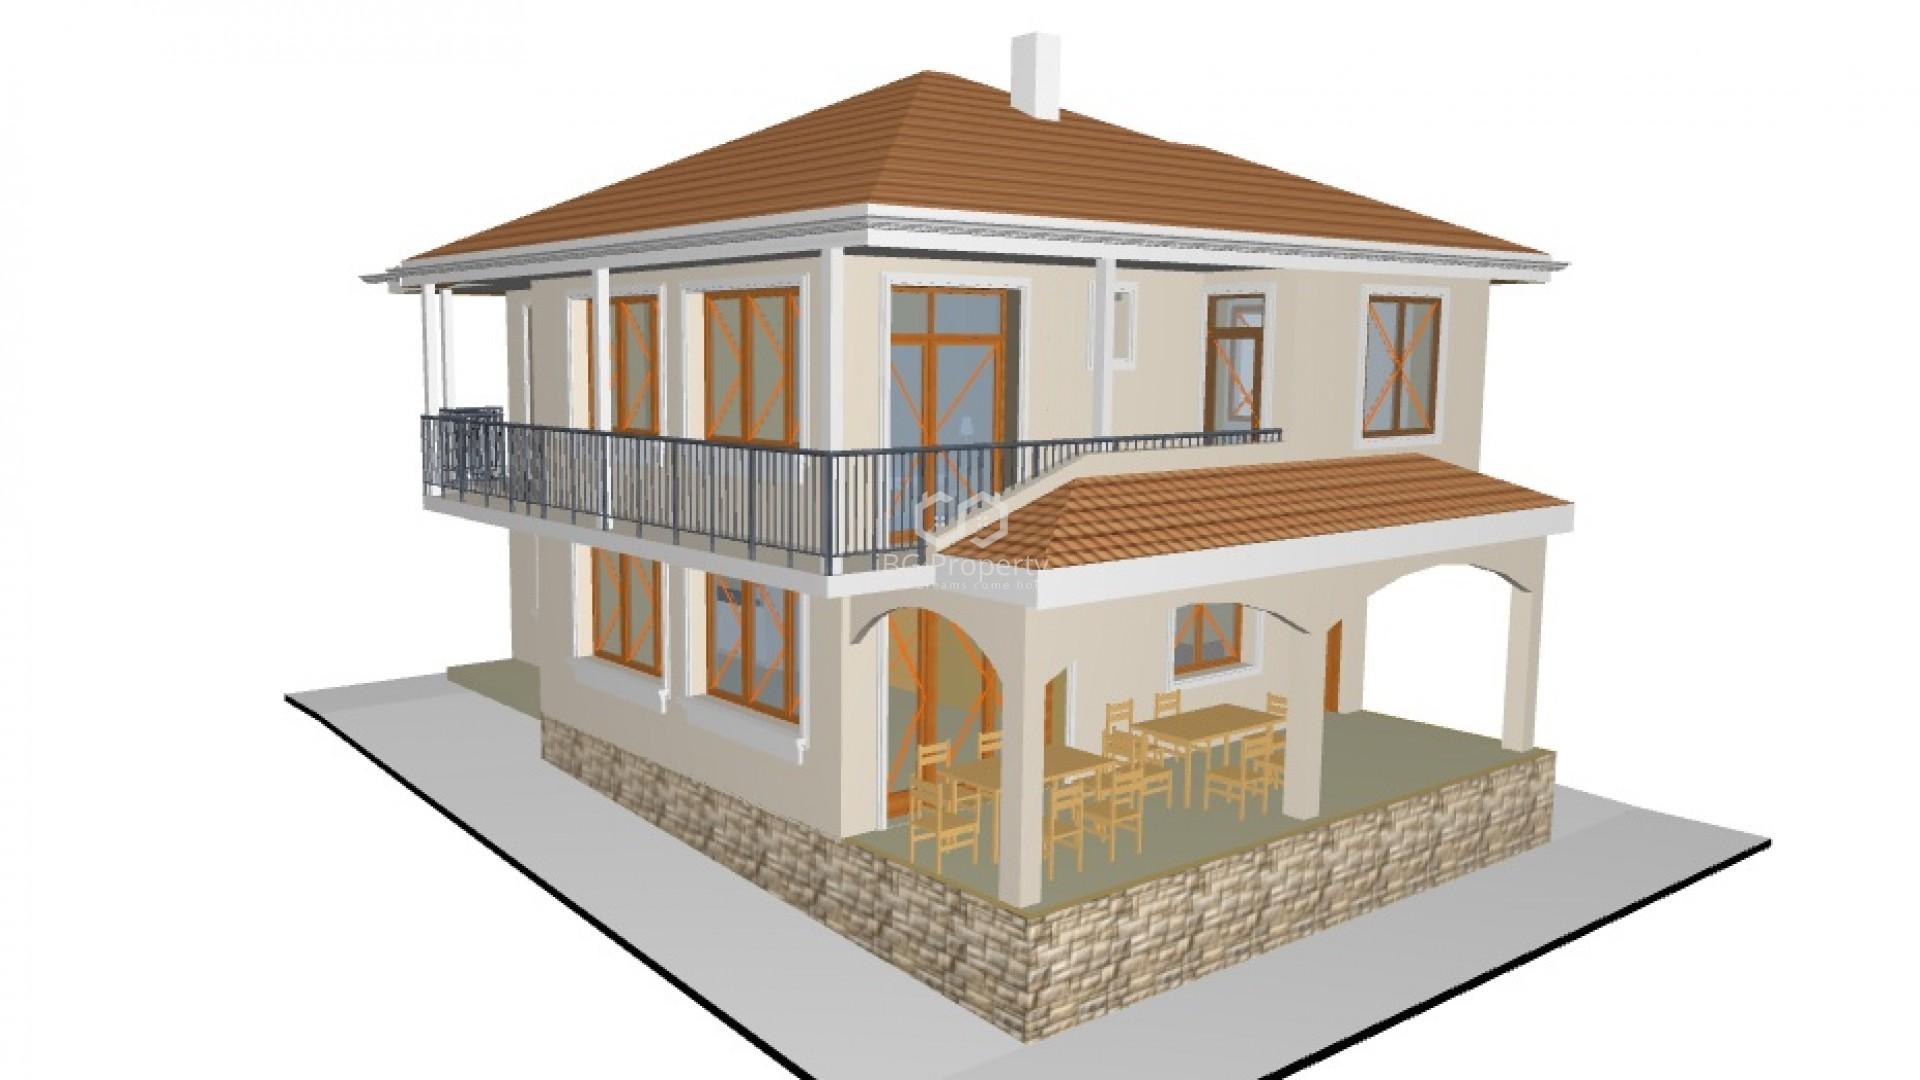 Haus in Banevo 186 m2